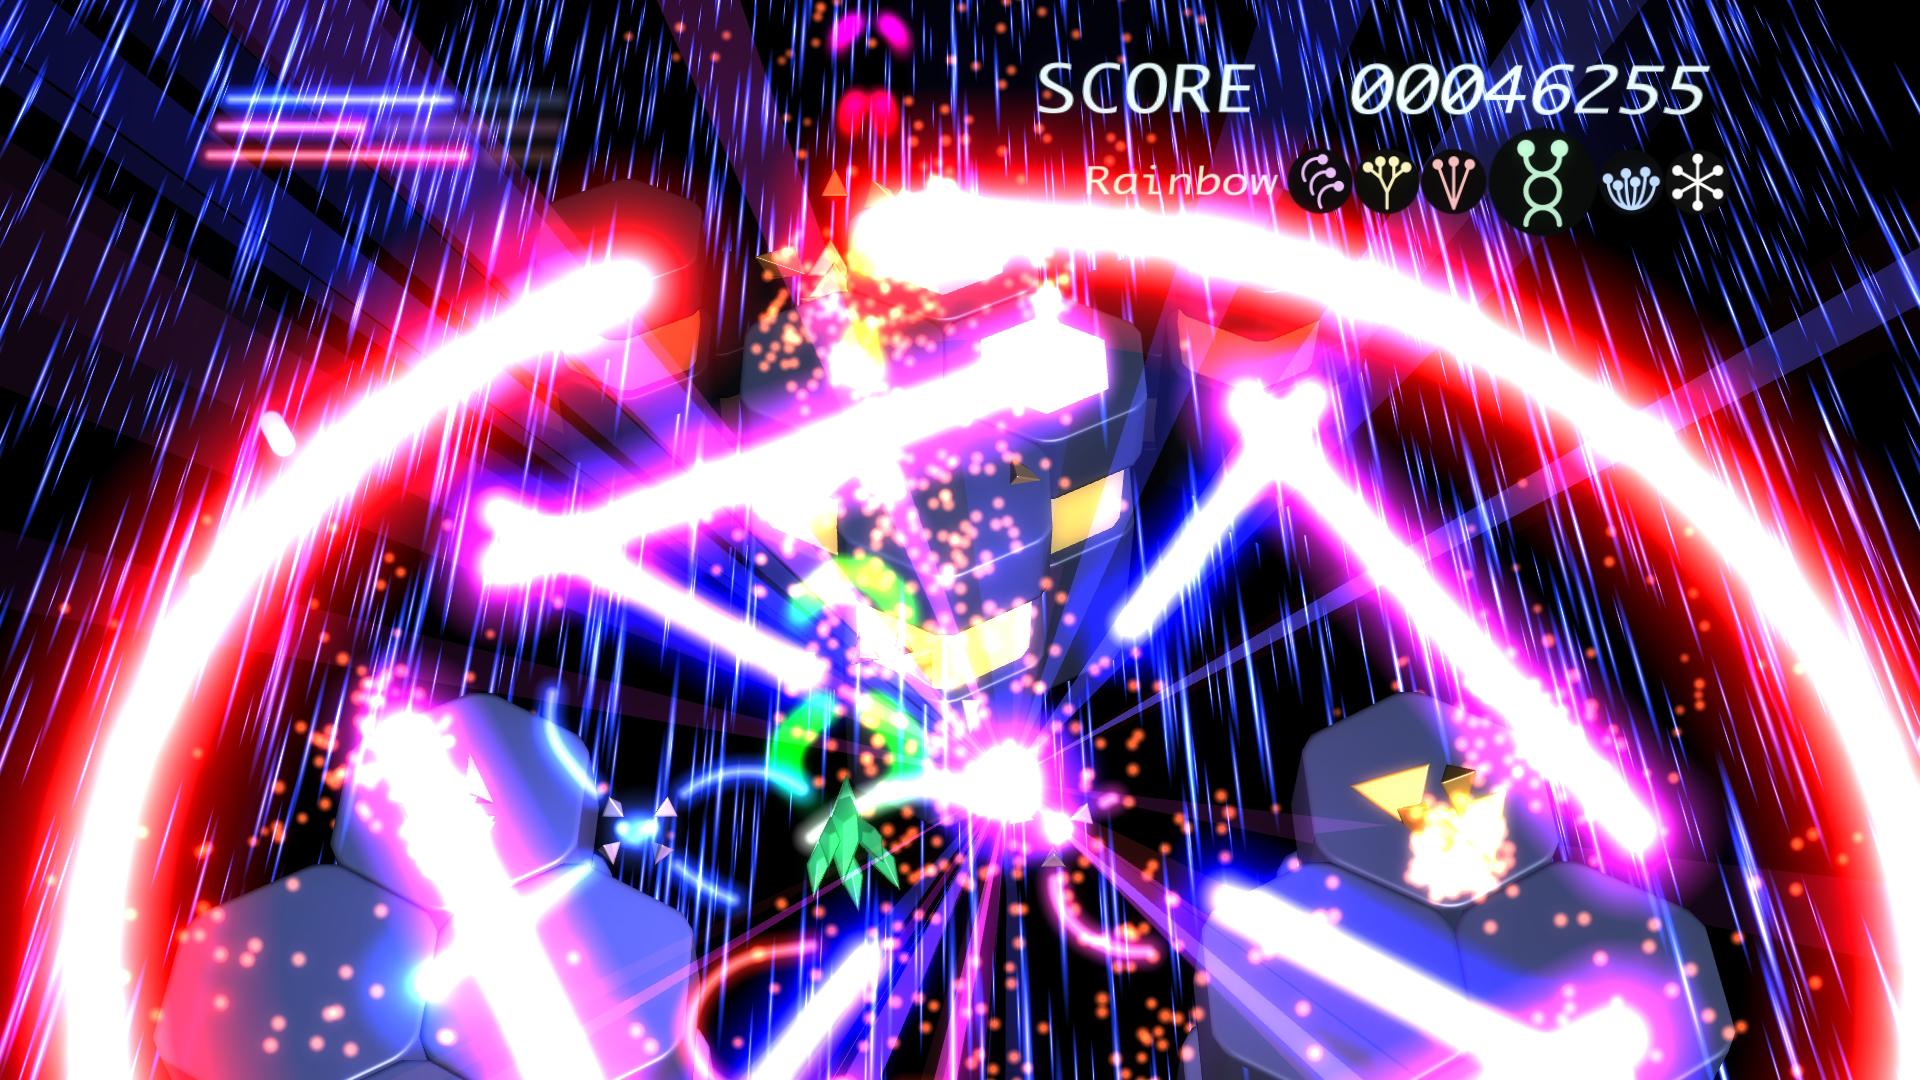 『Prismatic Solid』ゲーム画面